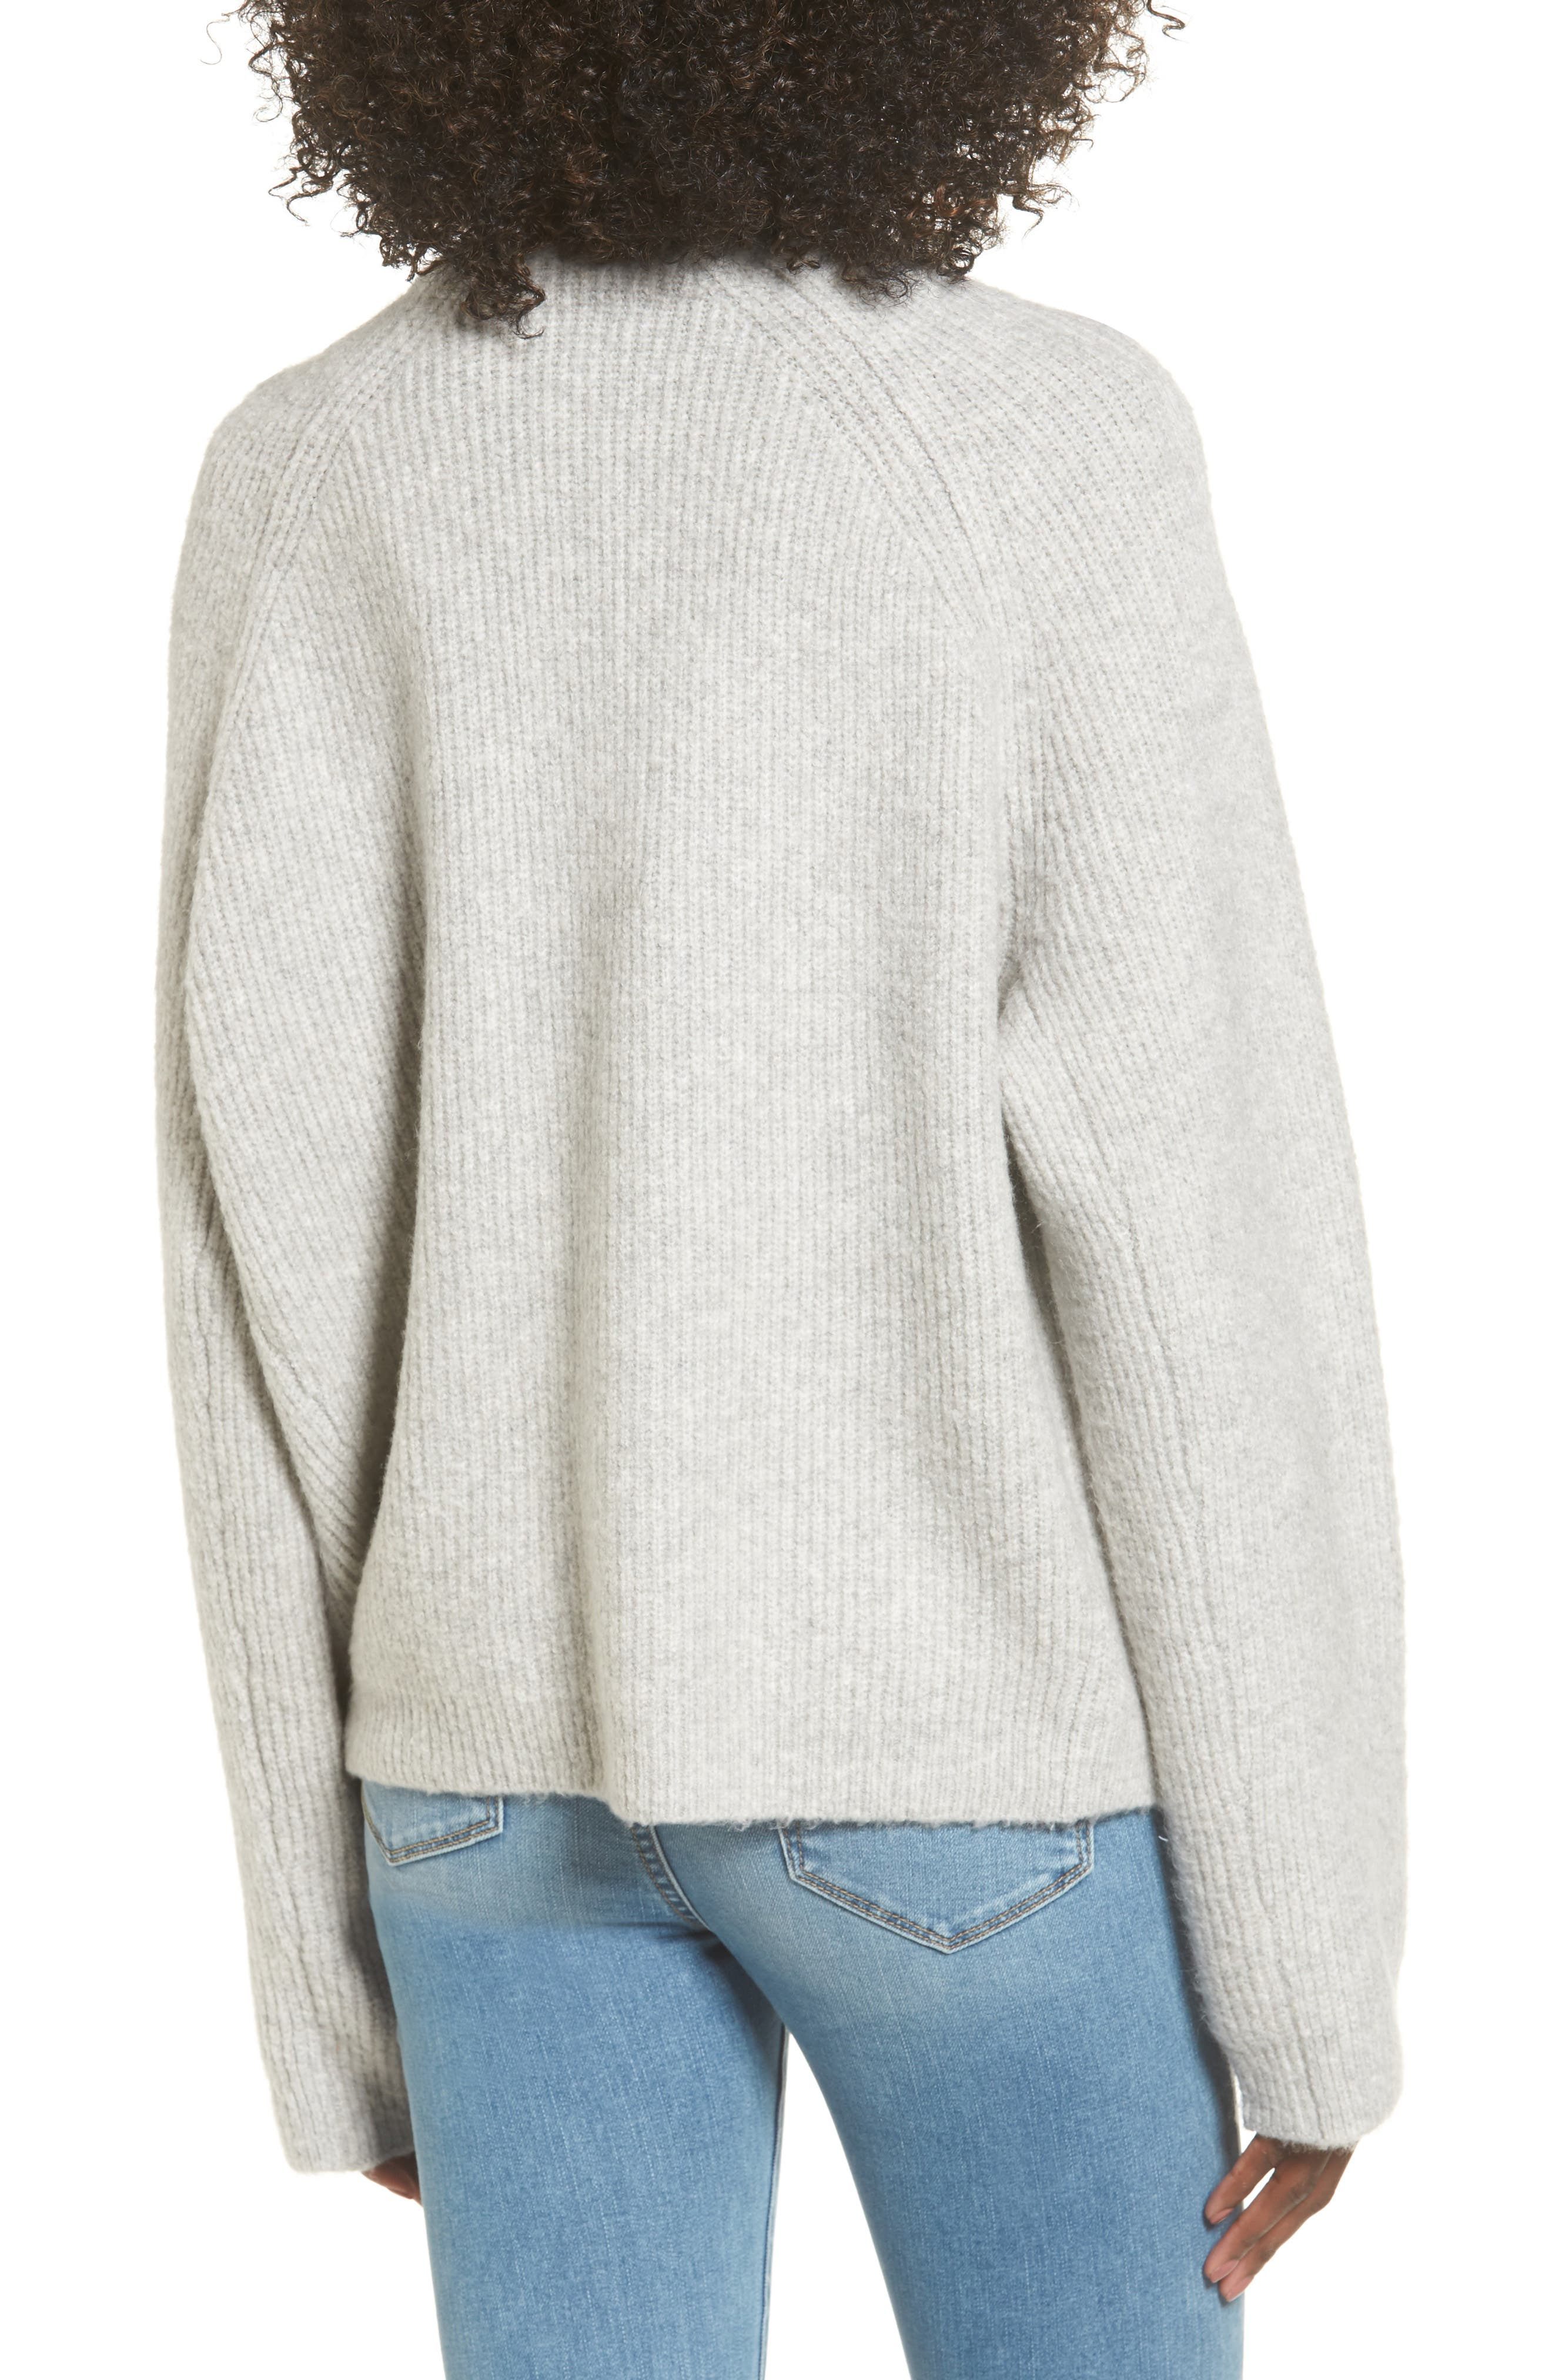 Cardigan Sweater,                             Alternate thumbnail 2, color,                             Grey Med Htr